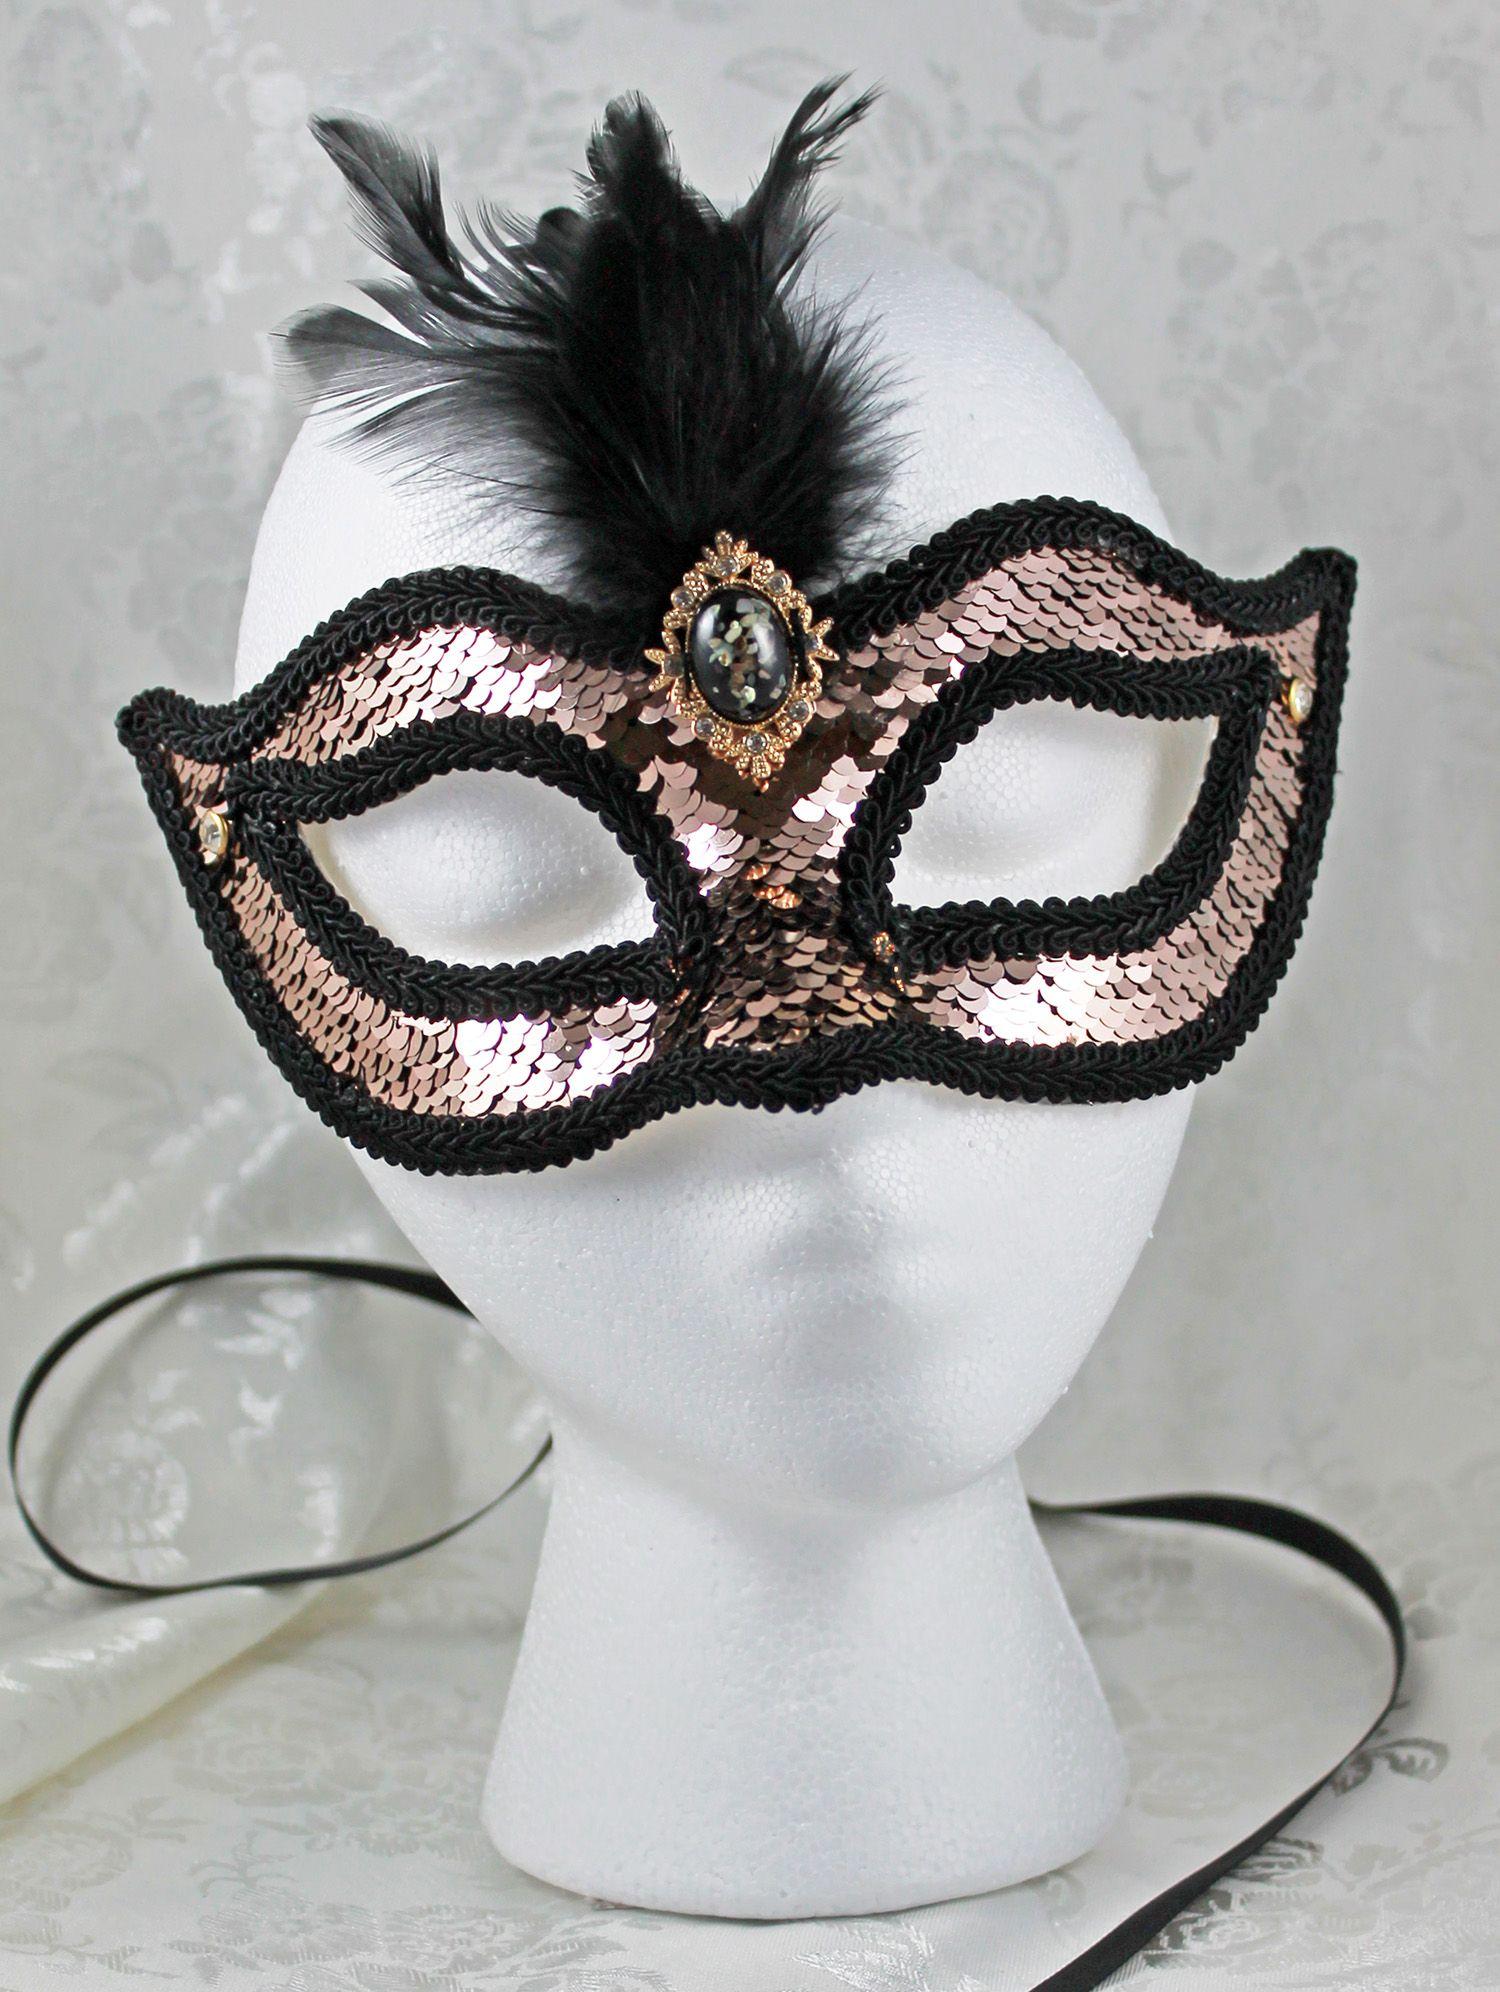 Silver Steampunk Accents Mardi-gras Masquerade Wedding Bridal Centerpiece Home Decor Vintage materials MASK custom made